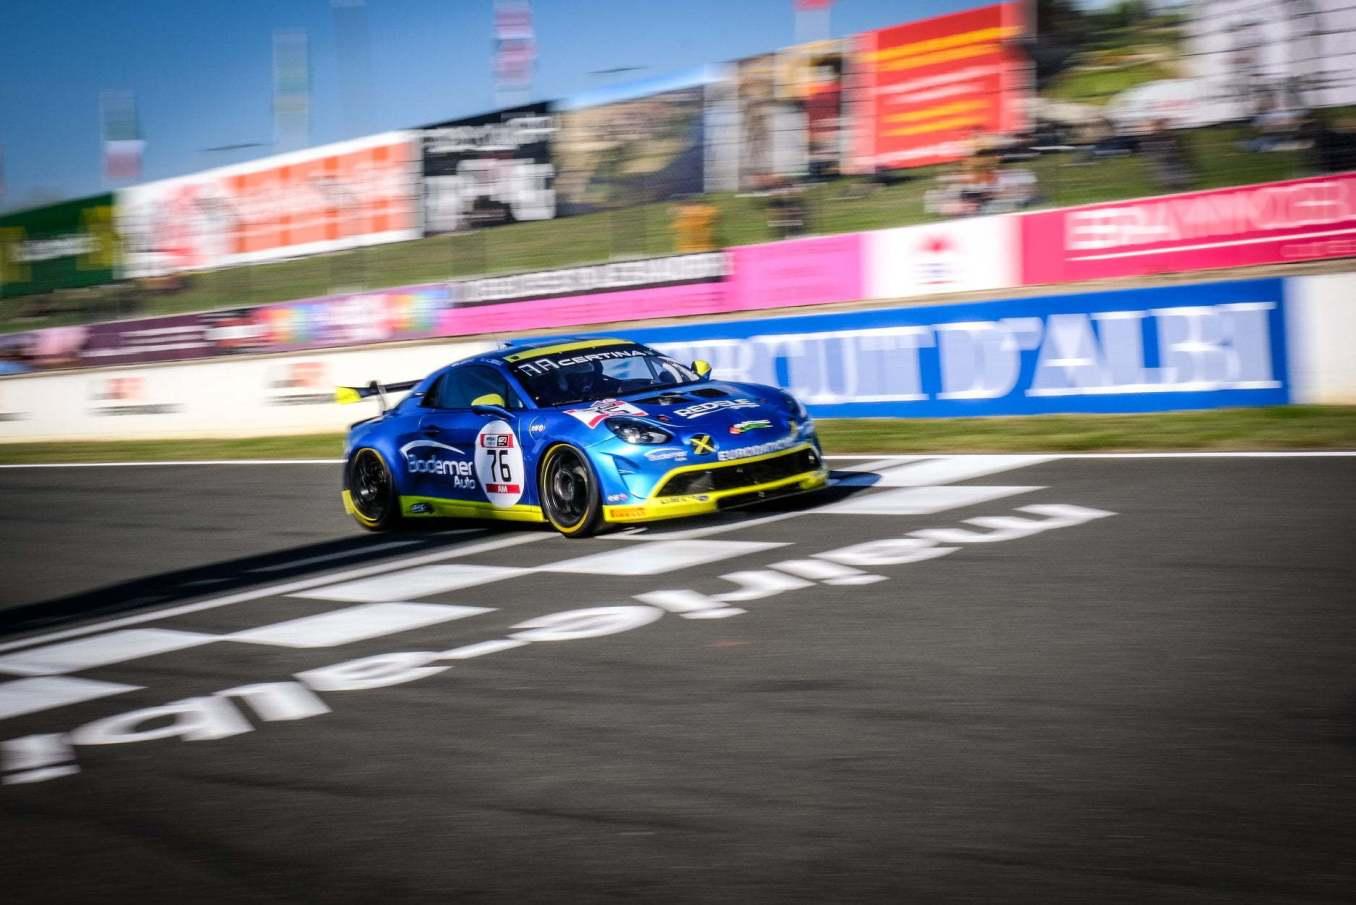 Alpine A110 GT4 FFSA GT 2020 Albi Course 2 9 | Alpine A110 GT4 : Herrero et Moullin-Traffort performent à Albi !